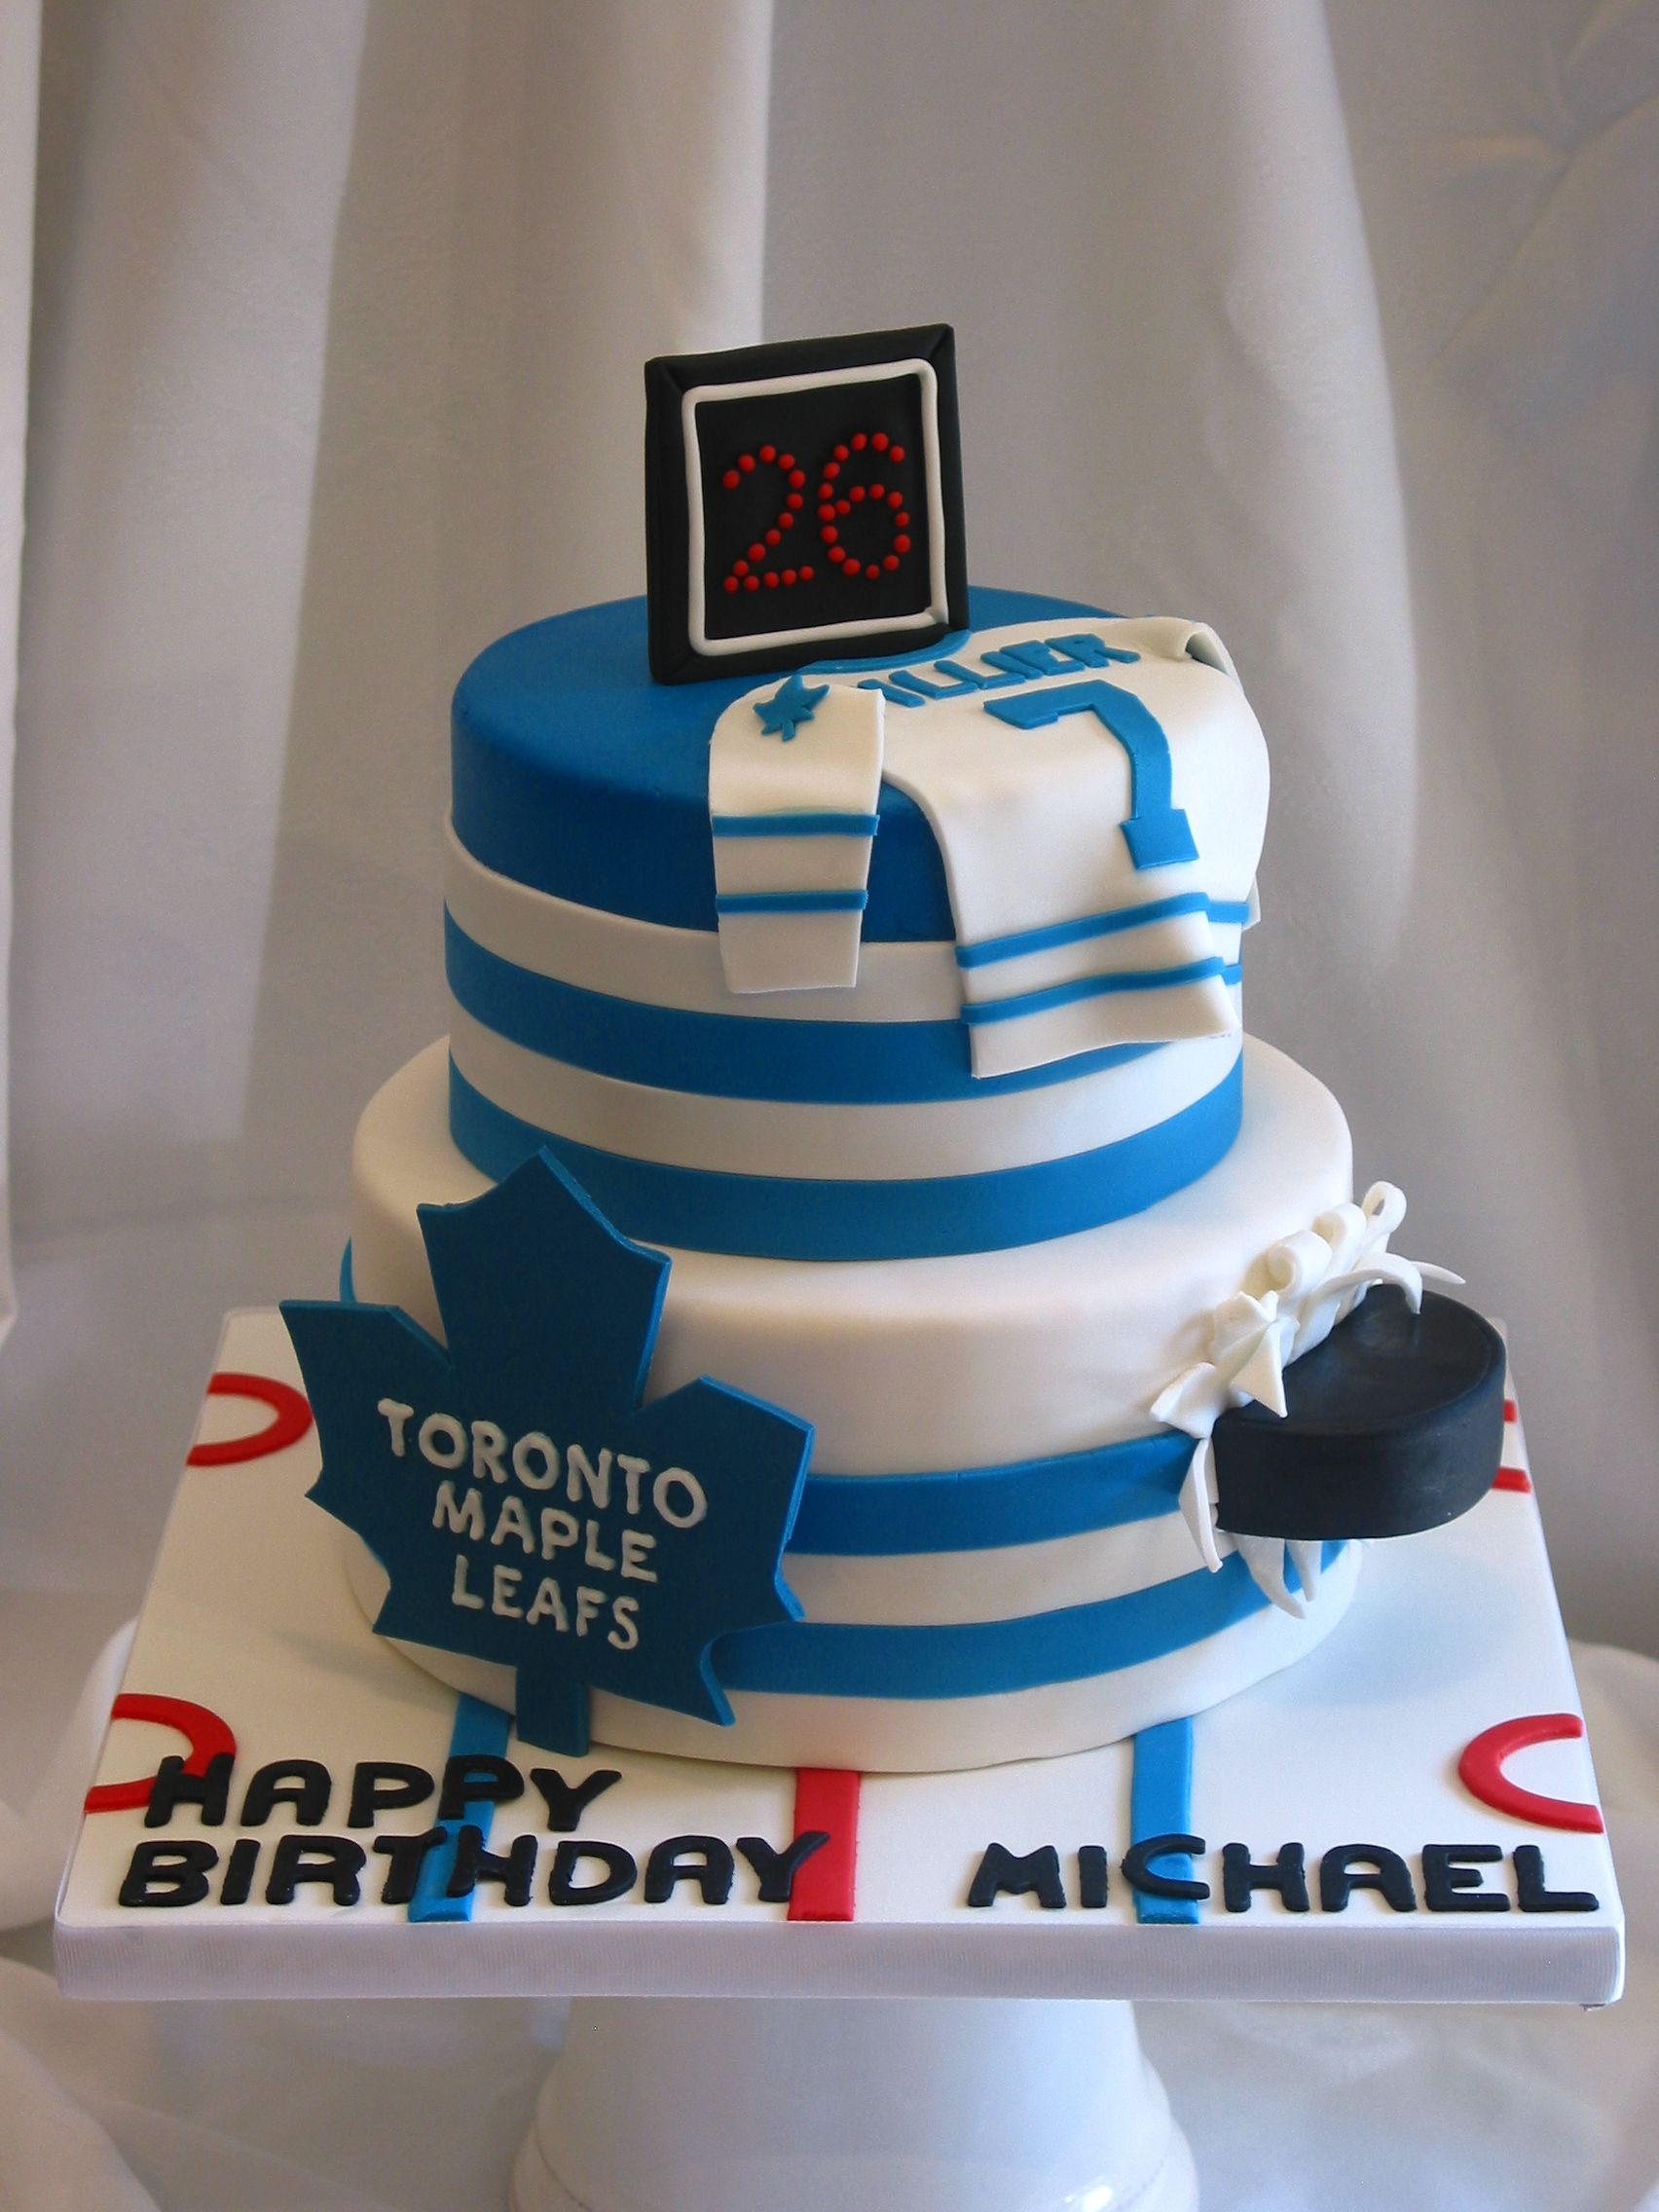 Pleasing Toronto Maple Leafs Birthday Cake Hockey Birthday Cake Hockey Funny Birthday Cards Online Benoljebrpdamsfinfo